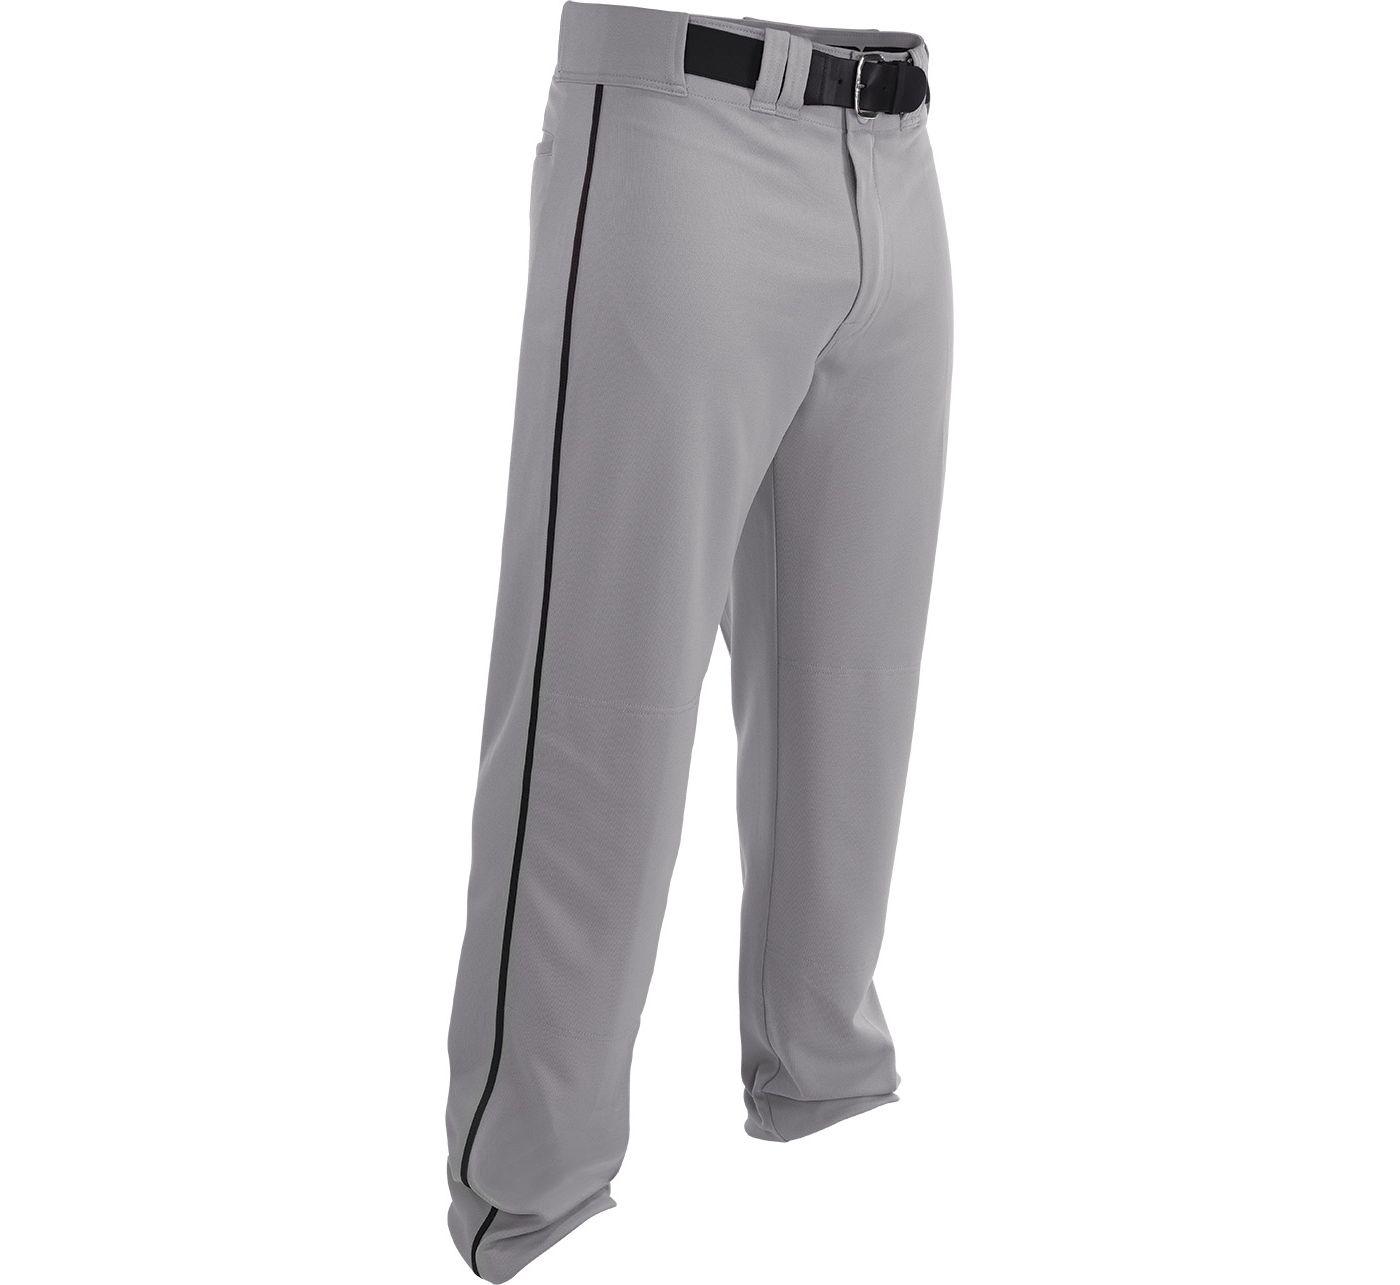 Easton Men's Rival 2 Piped Baseball Pants